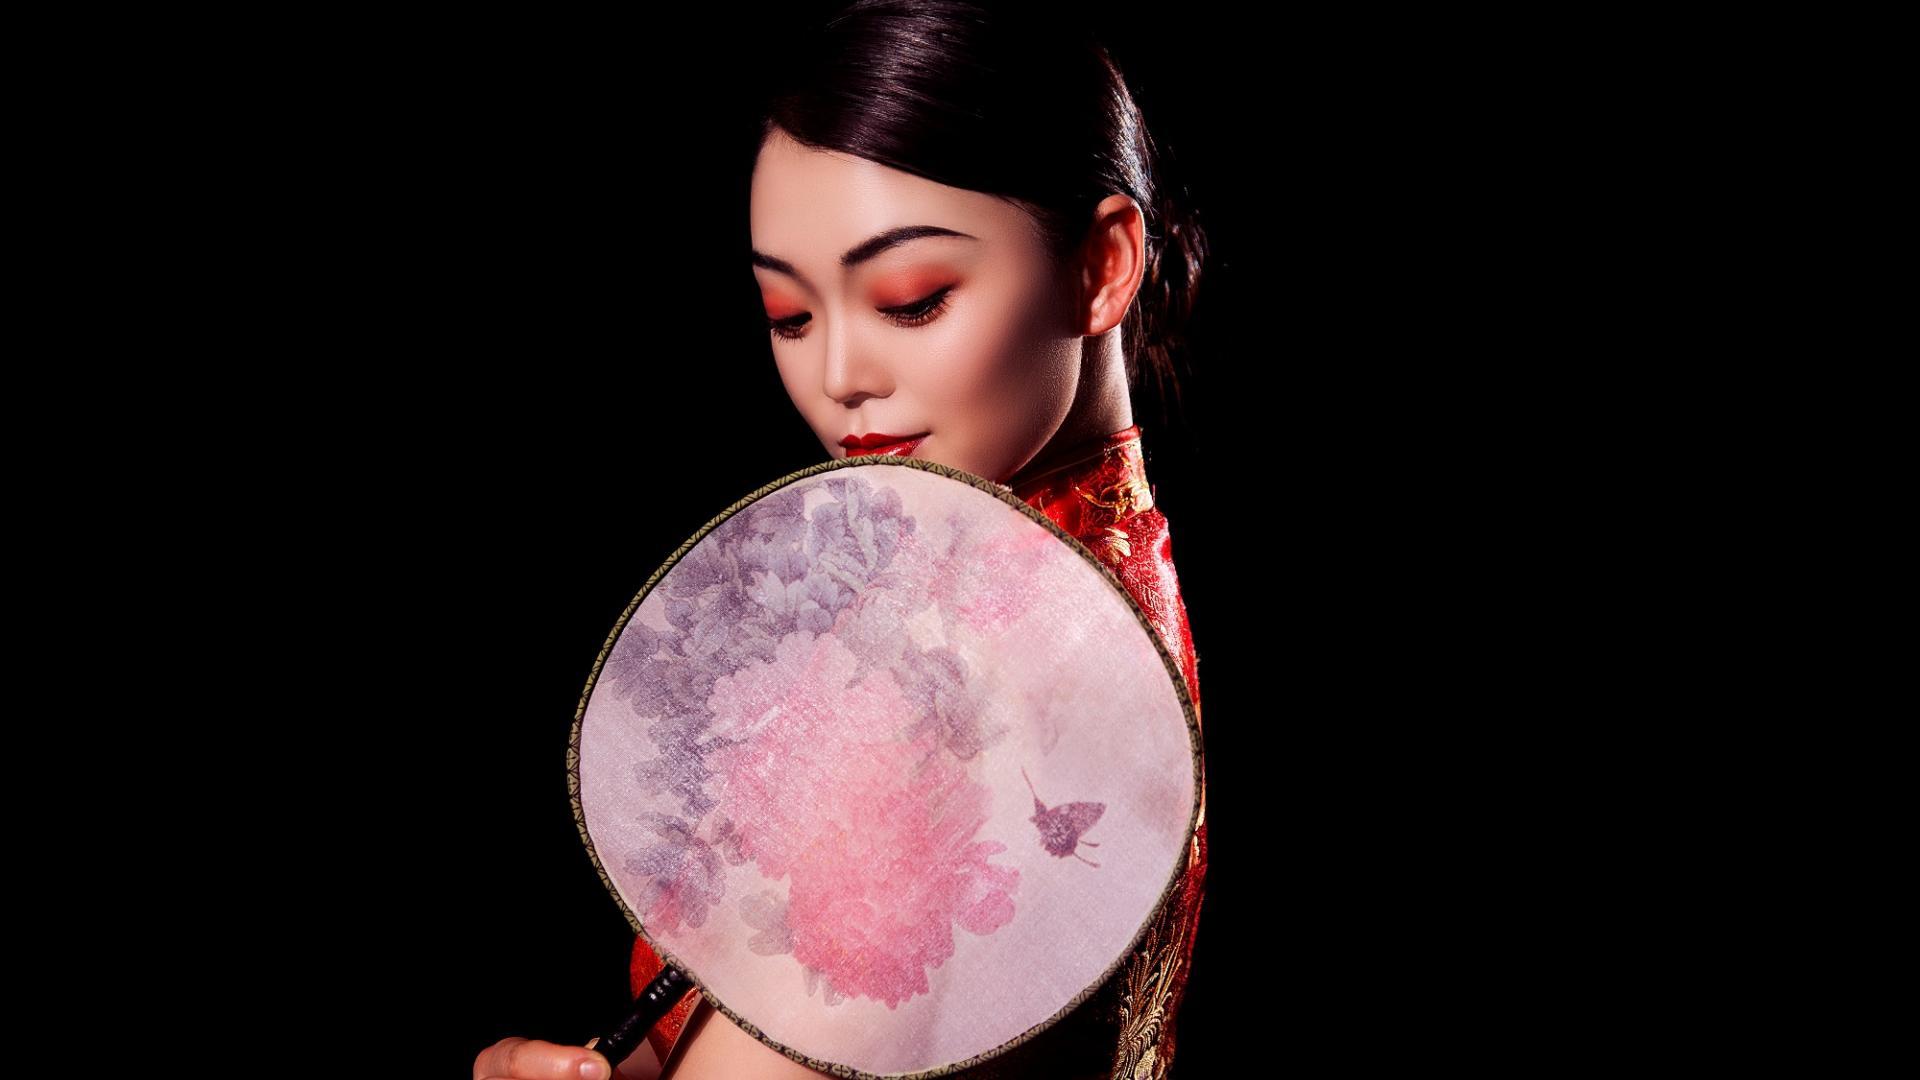 Frau, China